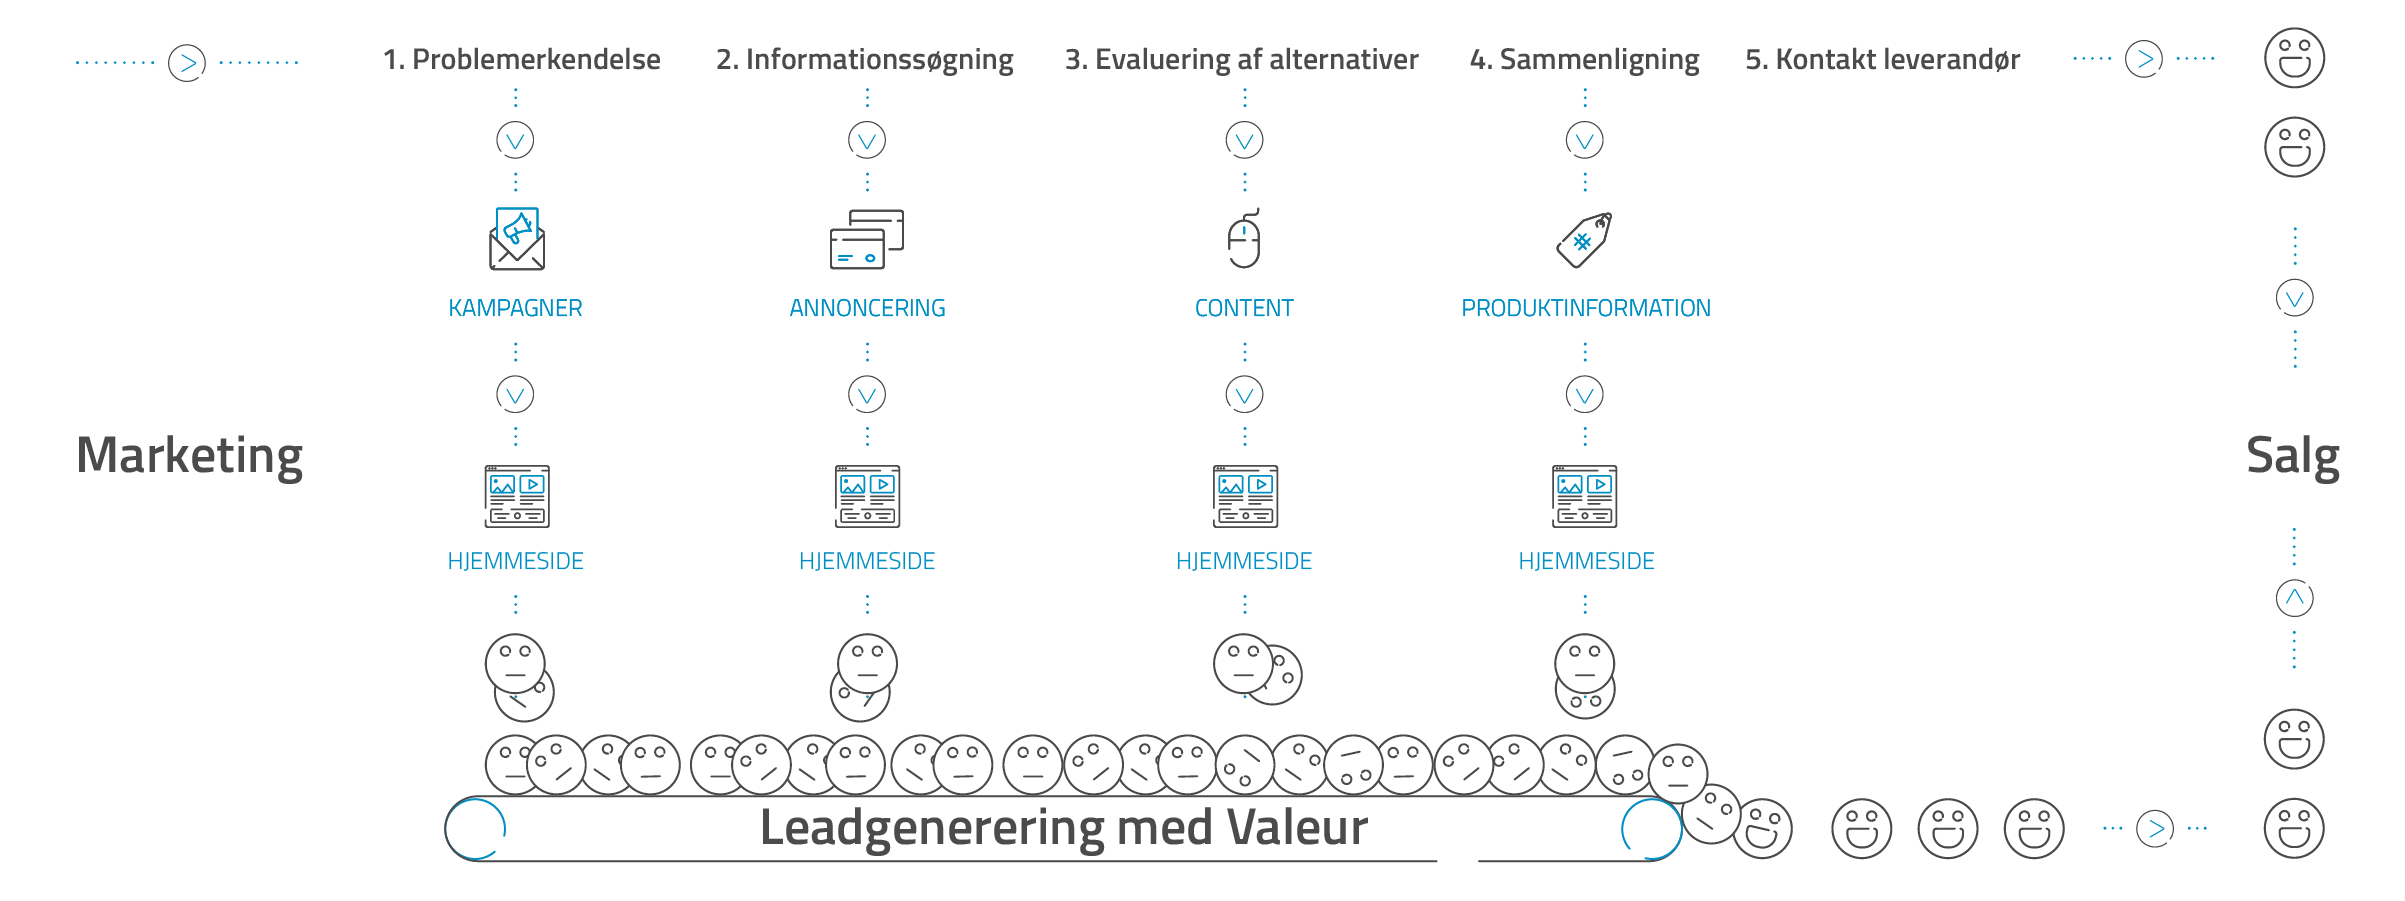 B2B leadgenerering i en digital beslutningsproces.